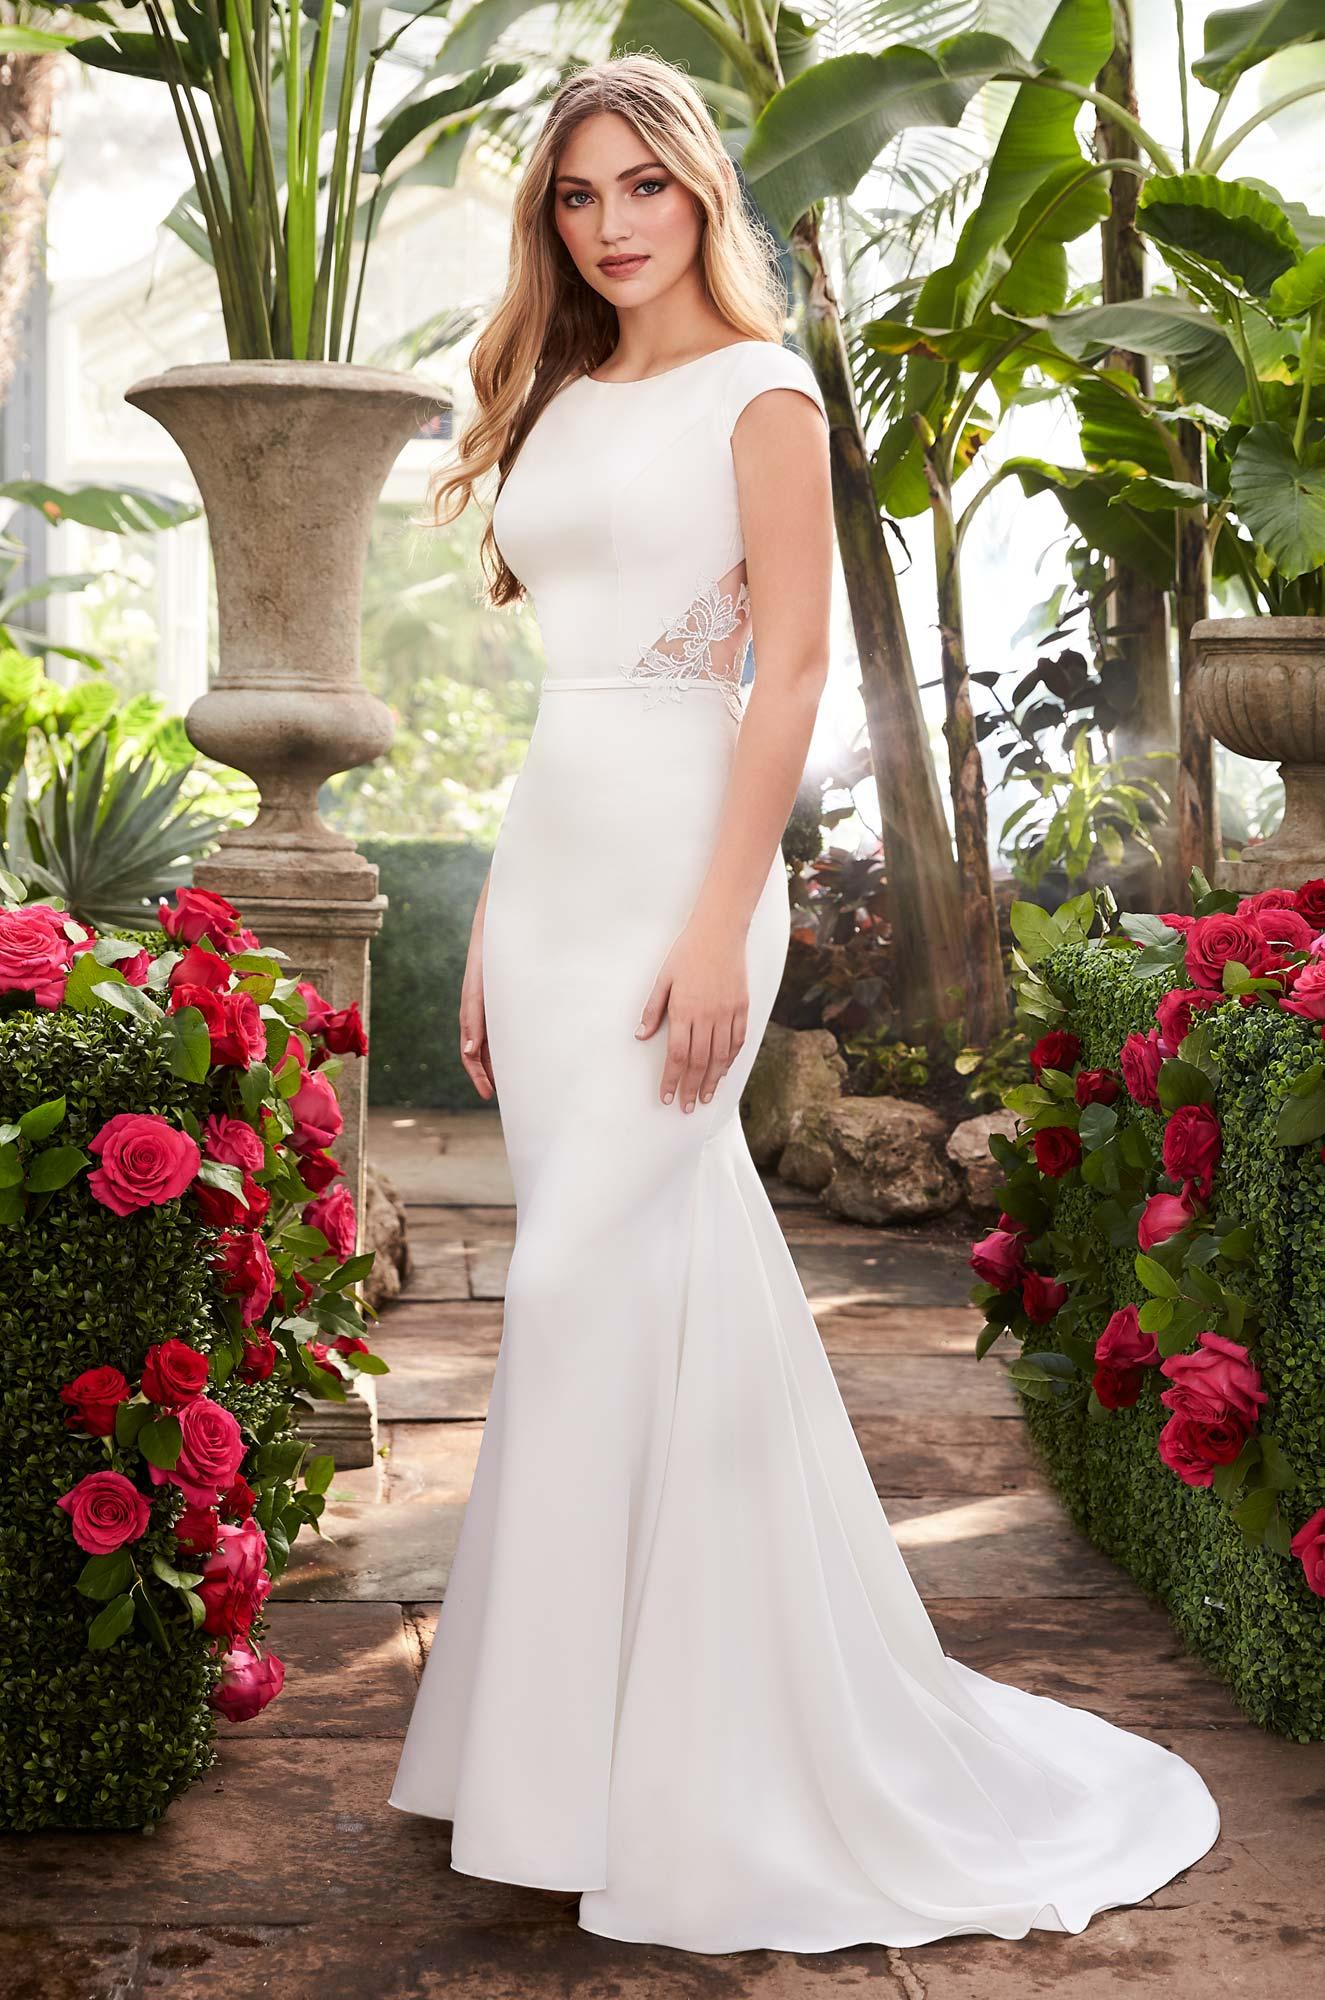 Statement Back Wedding Dress - Style #2250 | Mikaella Bridal